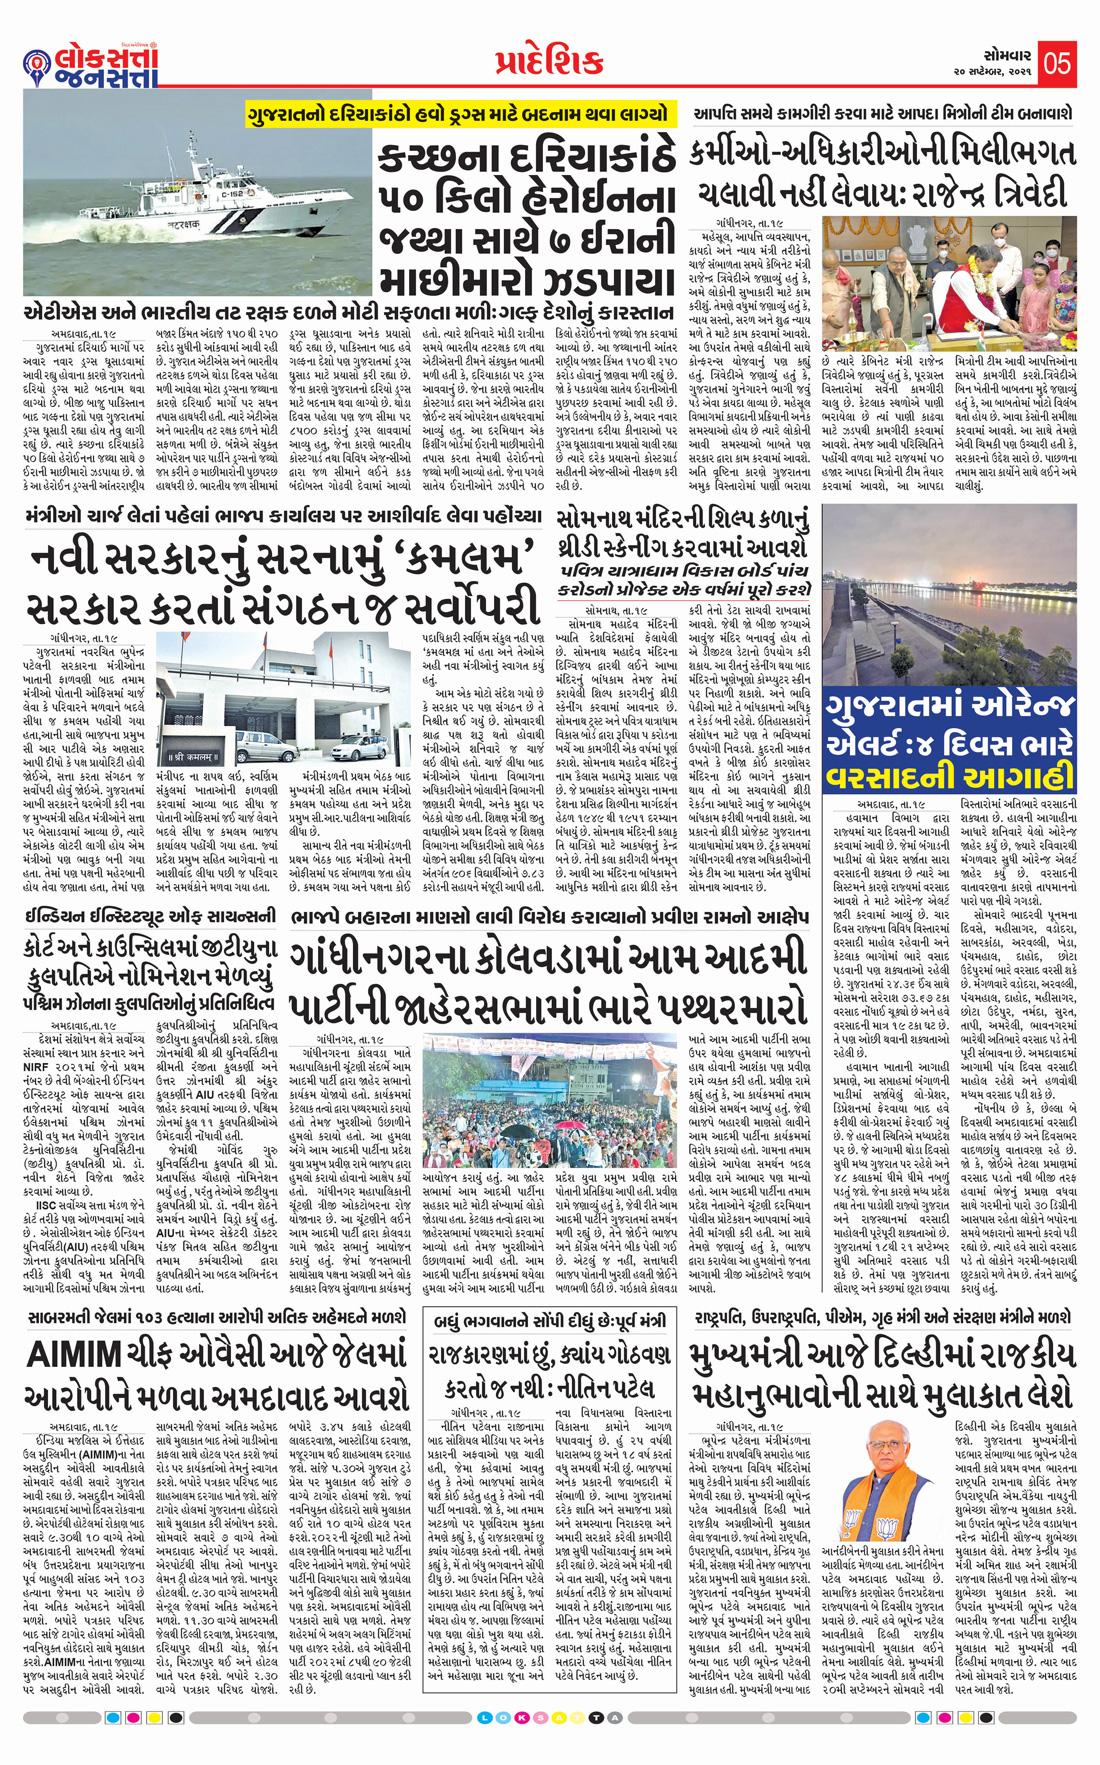 Loksatta Jansatta News Papaer E-paper dated 2021-09-20 | Page 5